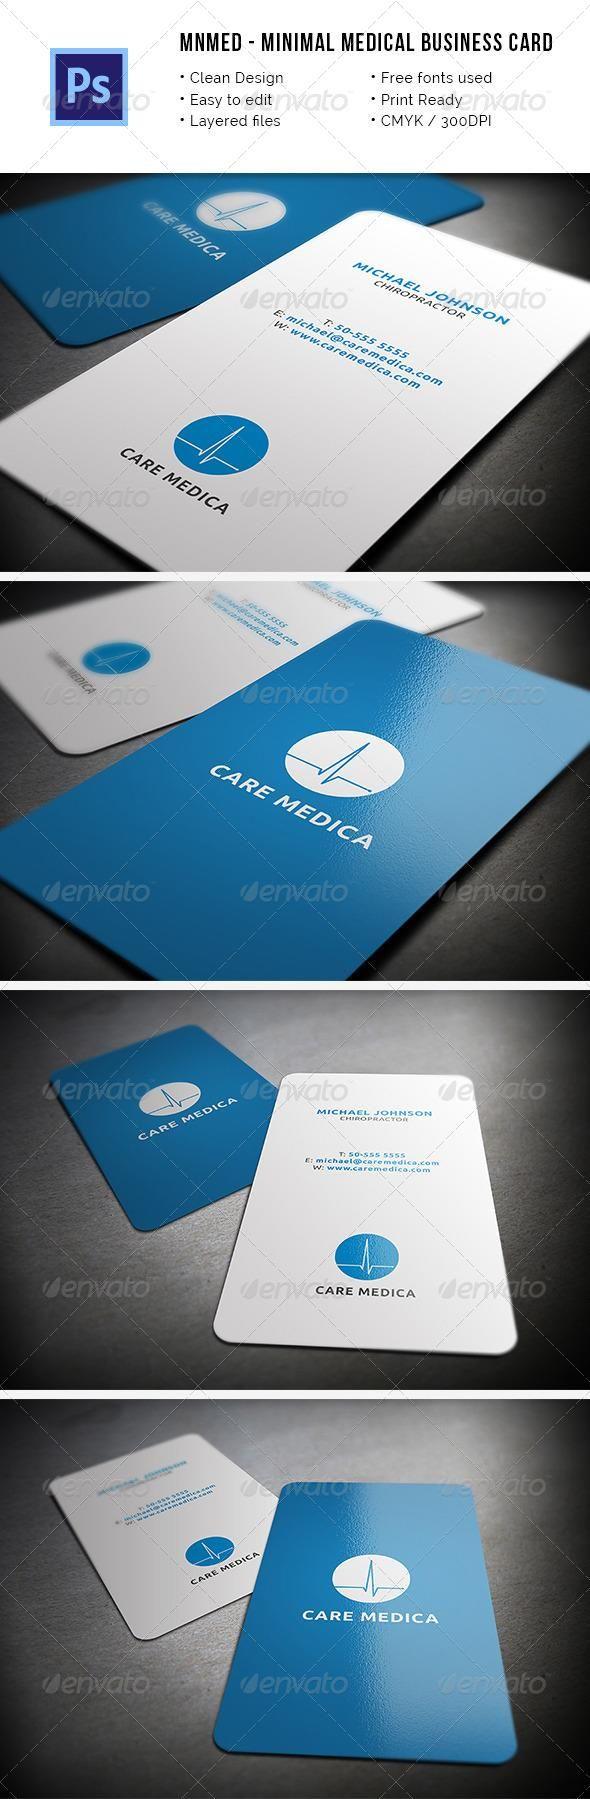 MnMed - Minimal Medical Business Card   Business card design ...